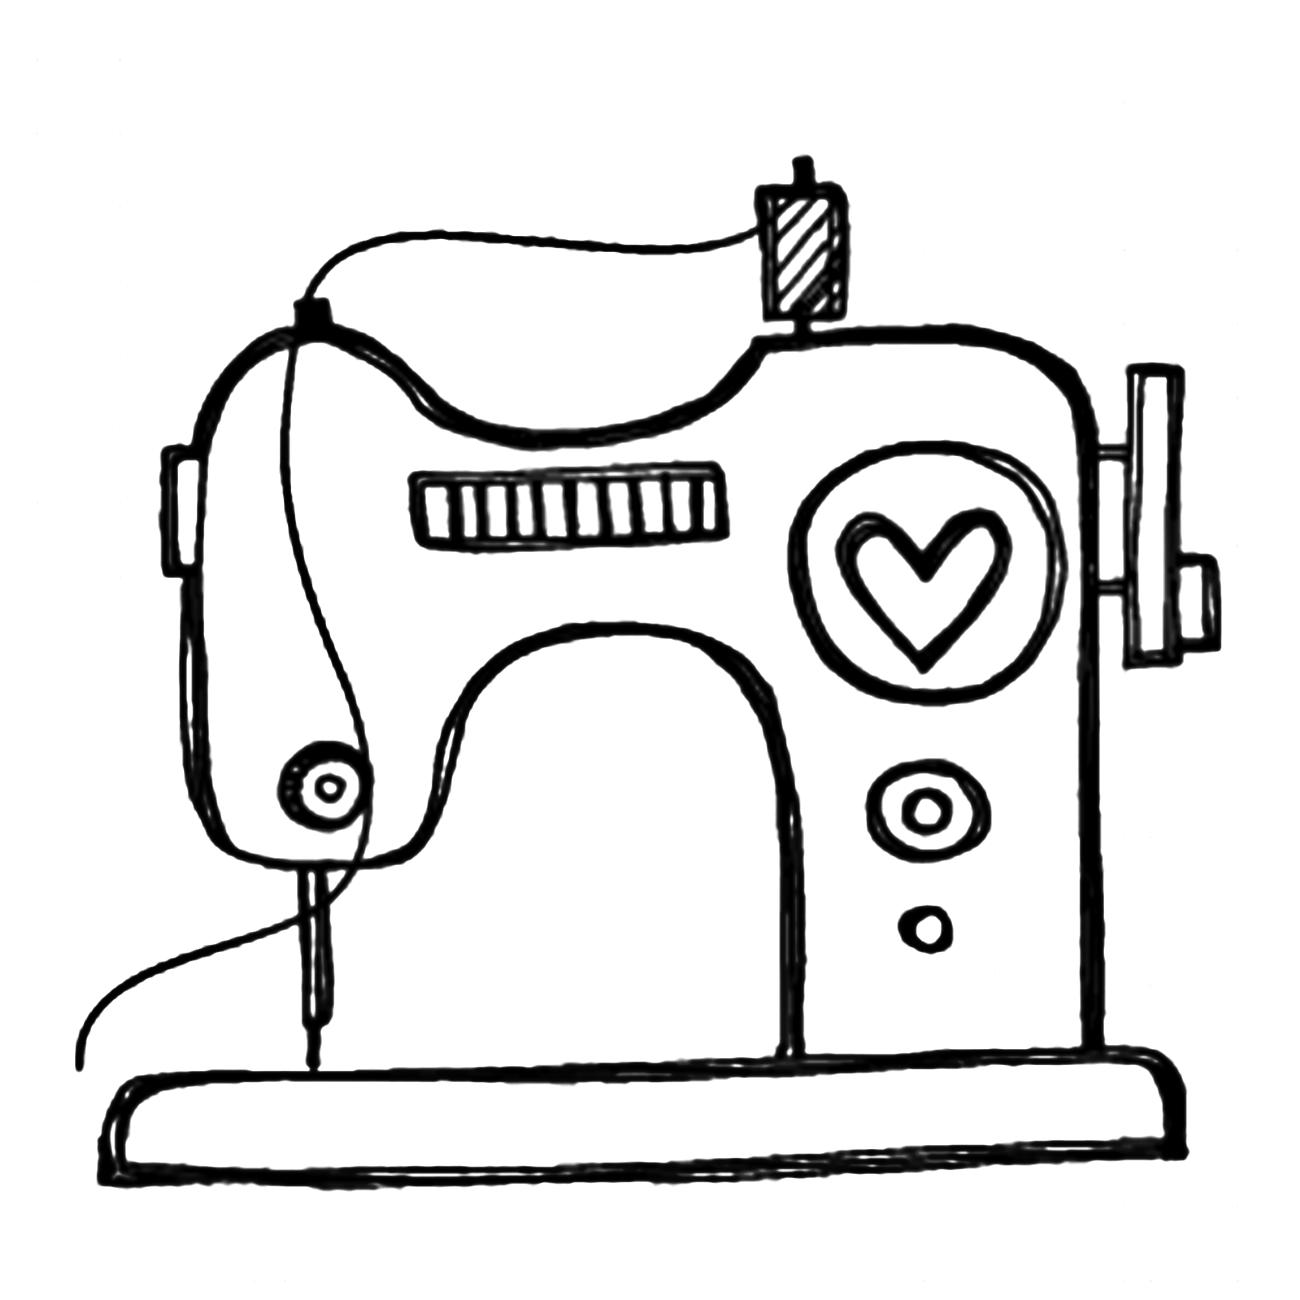 Riscos Graciosos Cute Drawings Maquinas De Costura Sewing